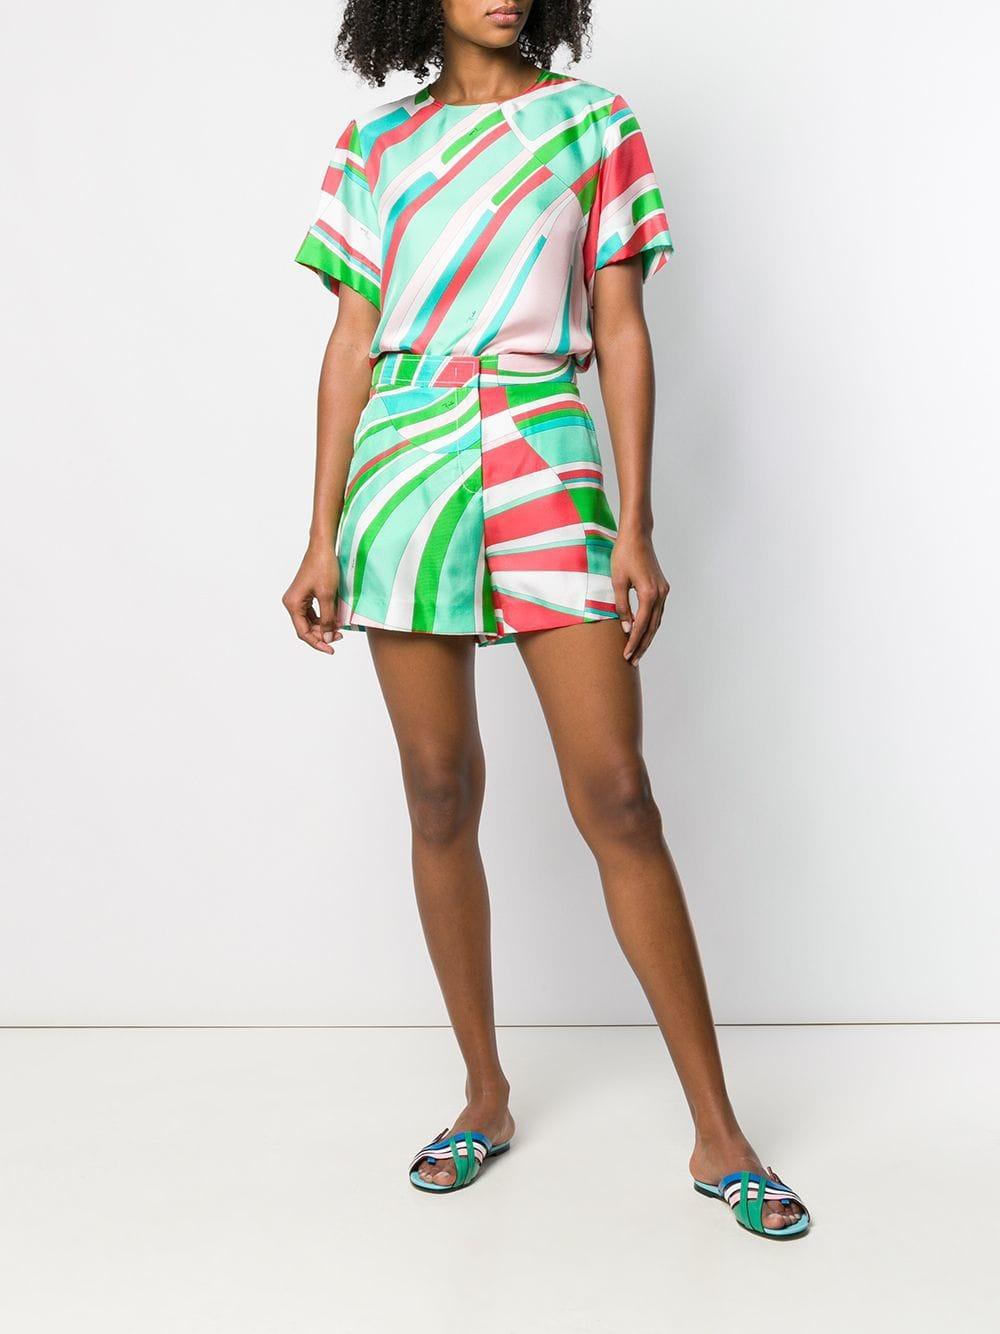 7f3758d1b5a5 Lyst - Emilio Pucci Shell Print Silk Shorts in Pink